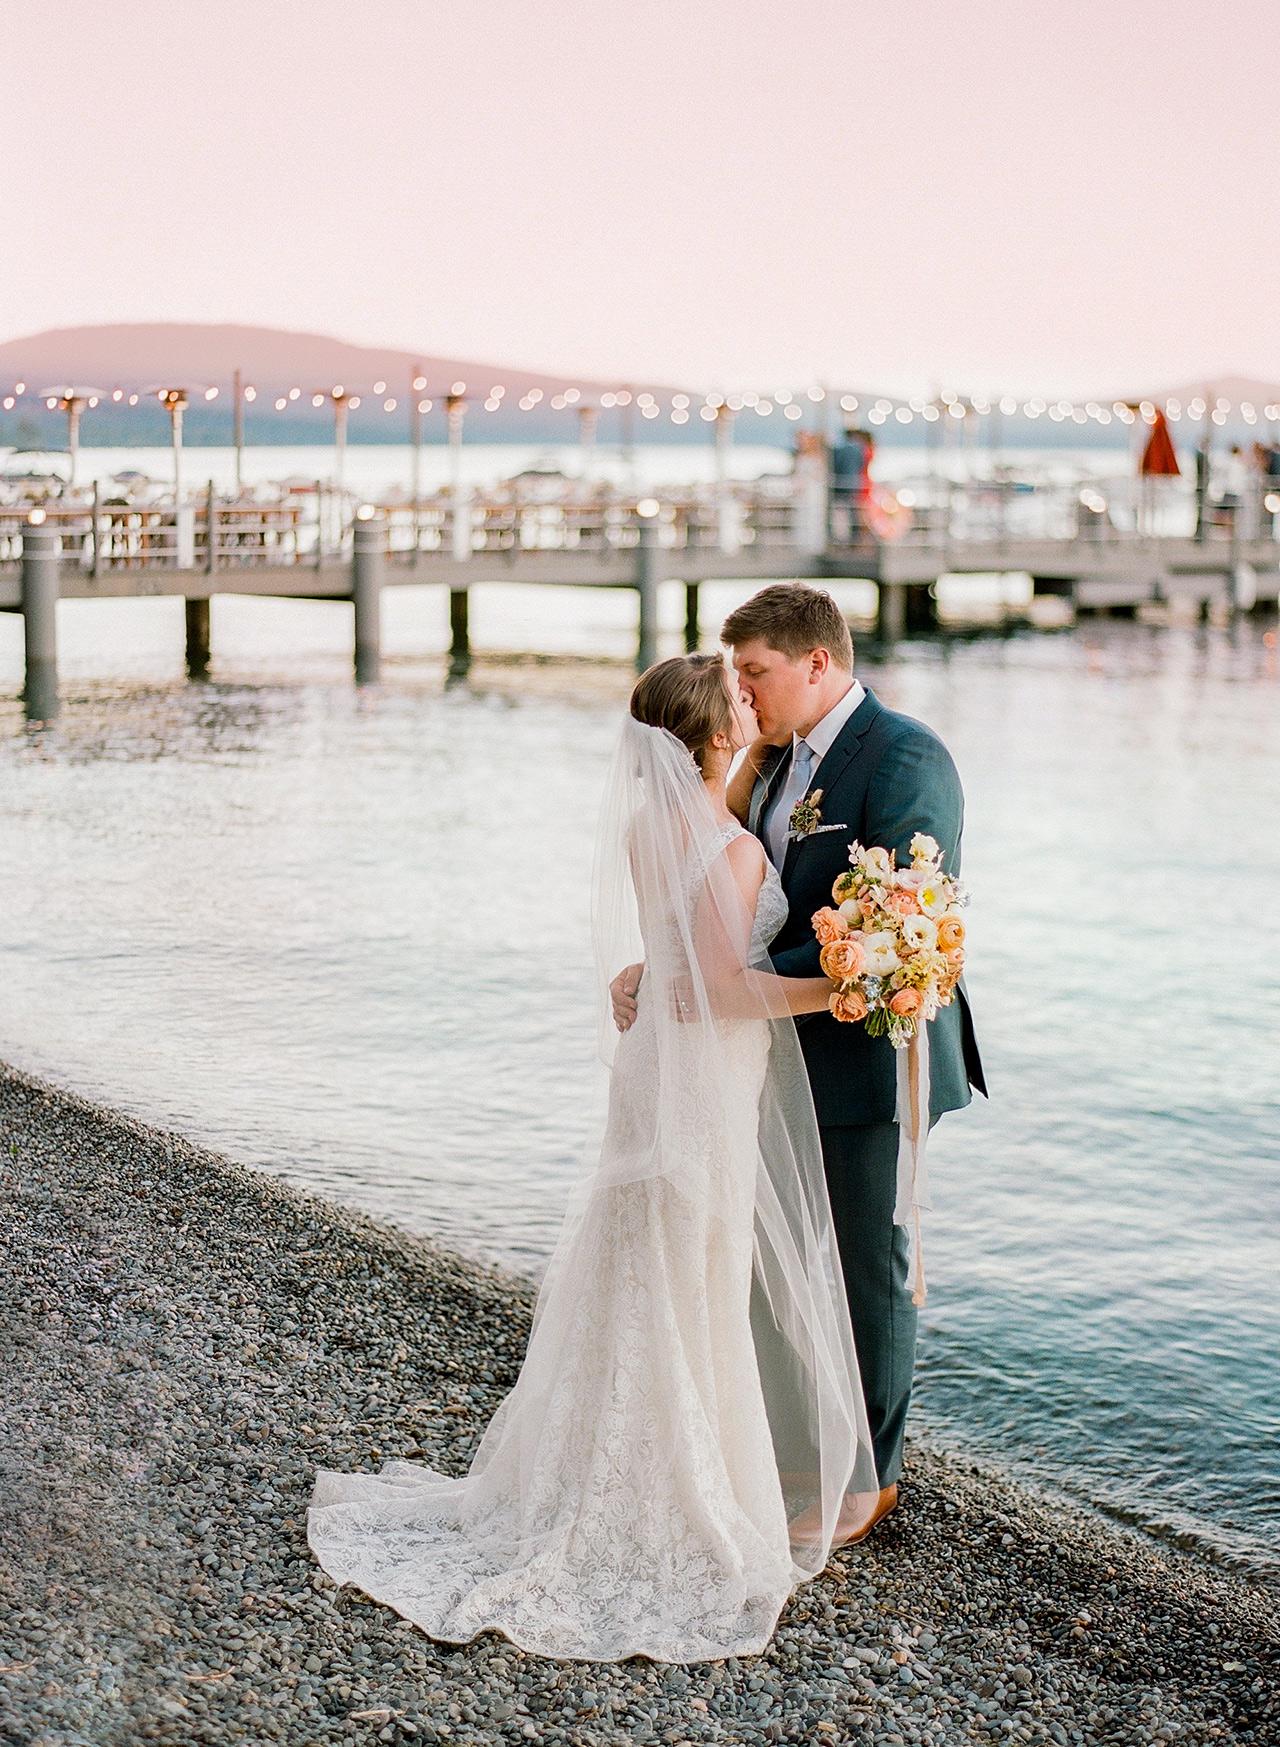 wedding couple kiss lake beach dock view